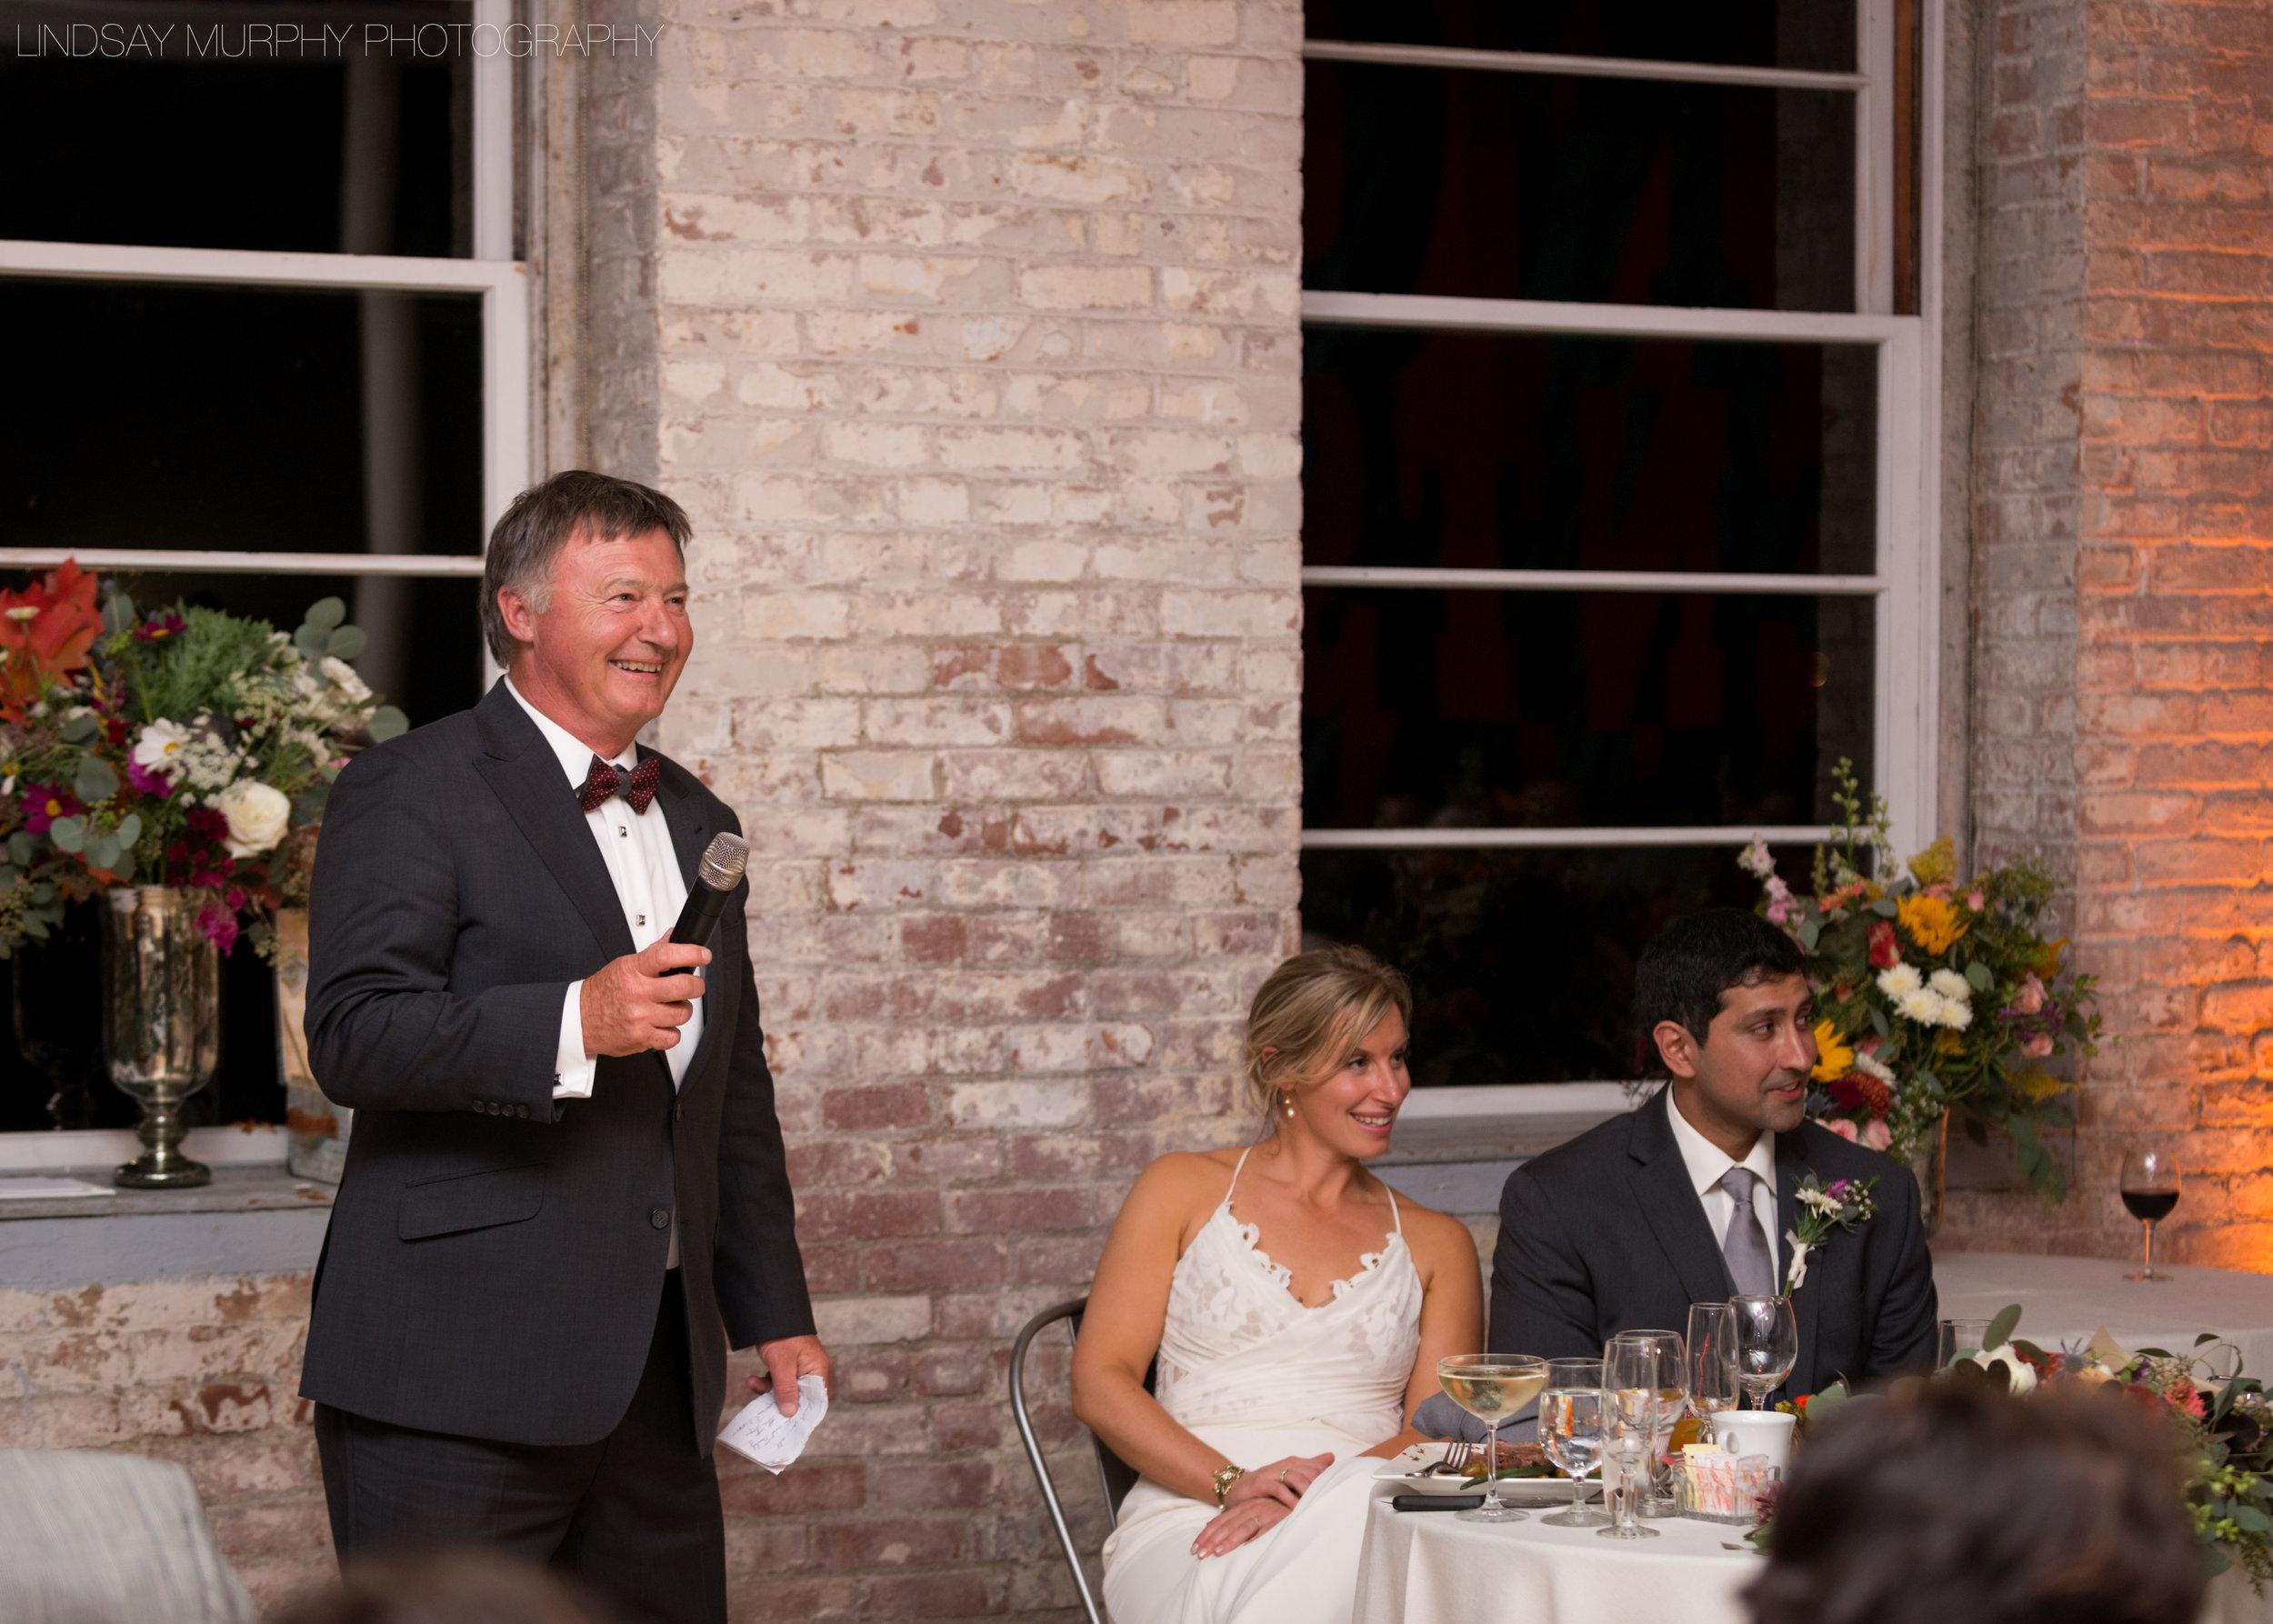 New_England_wedding-67.jpg